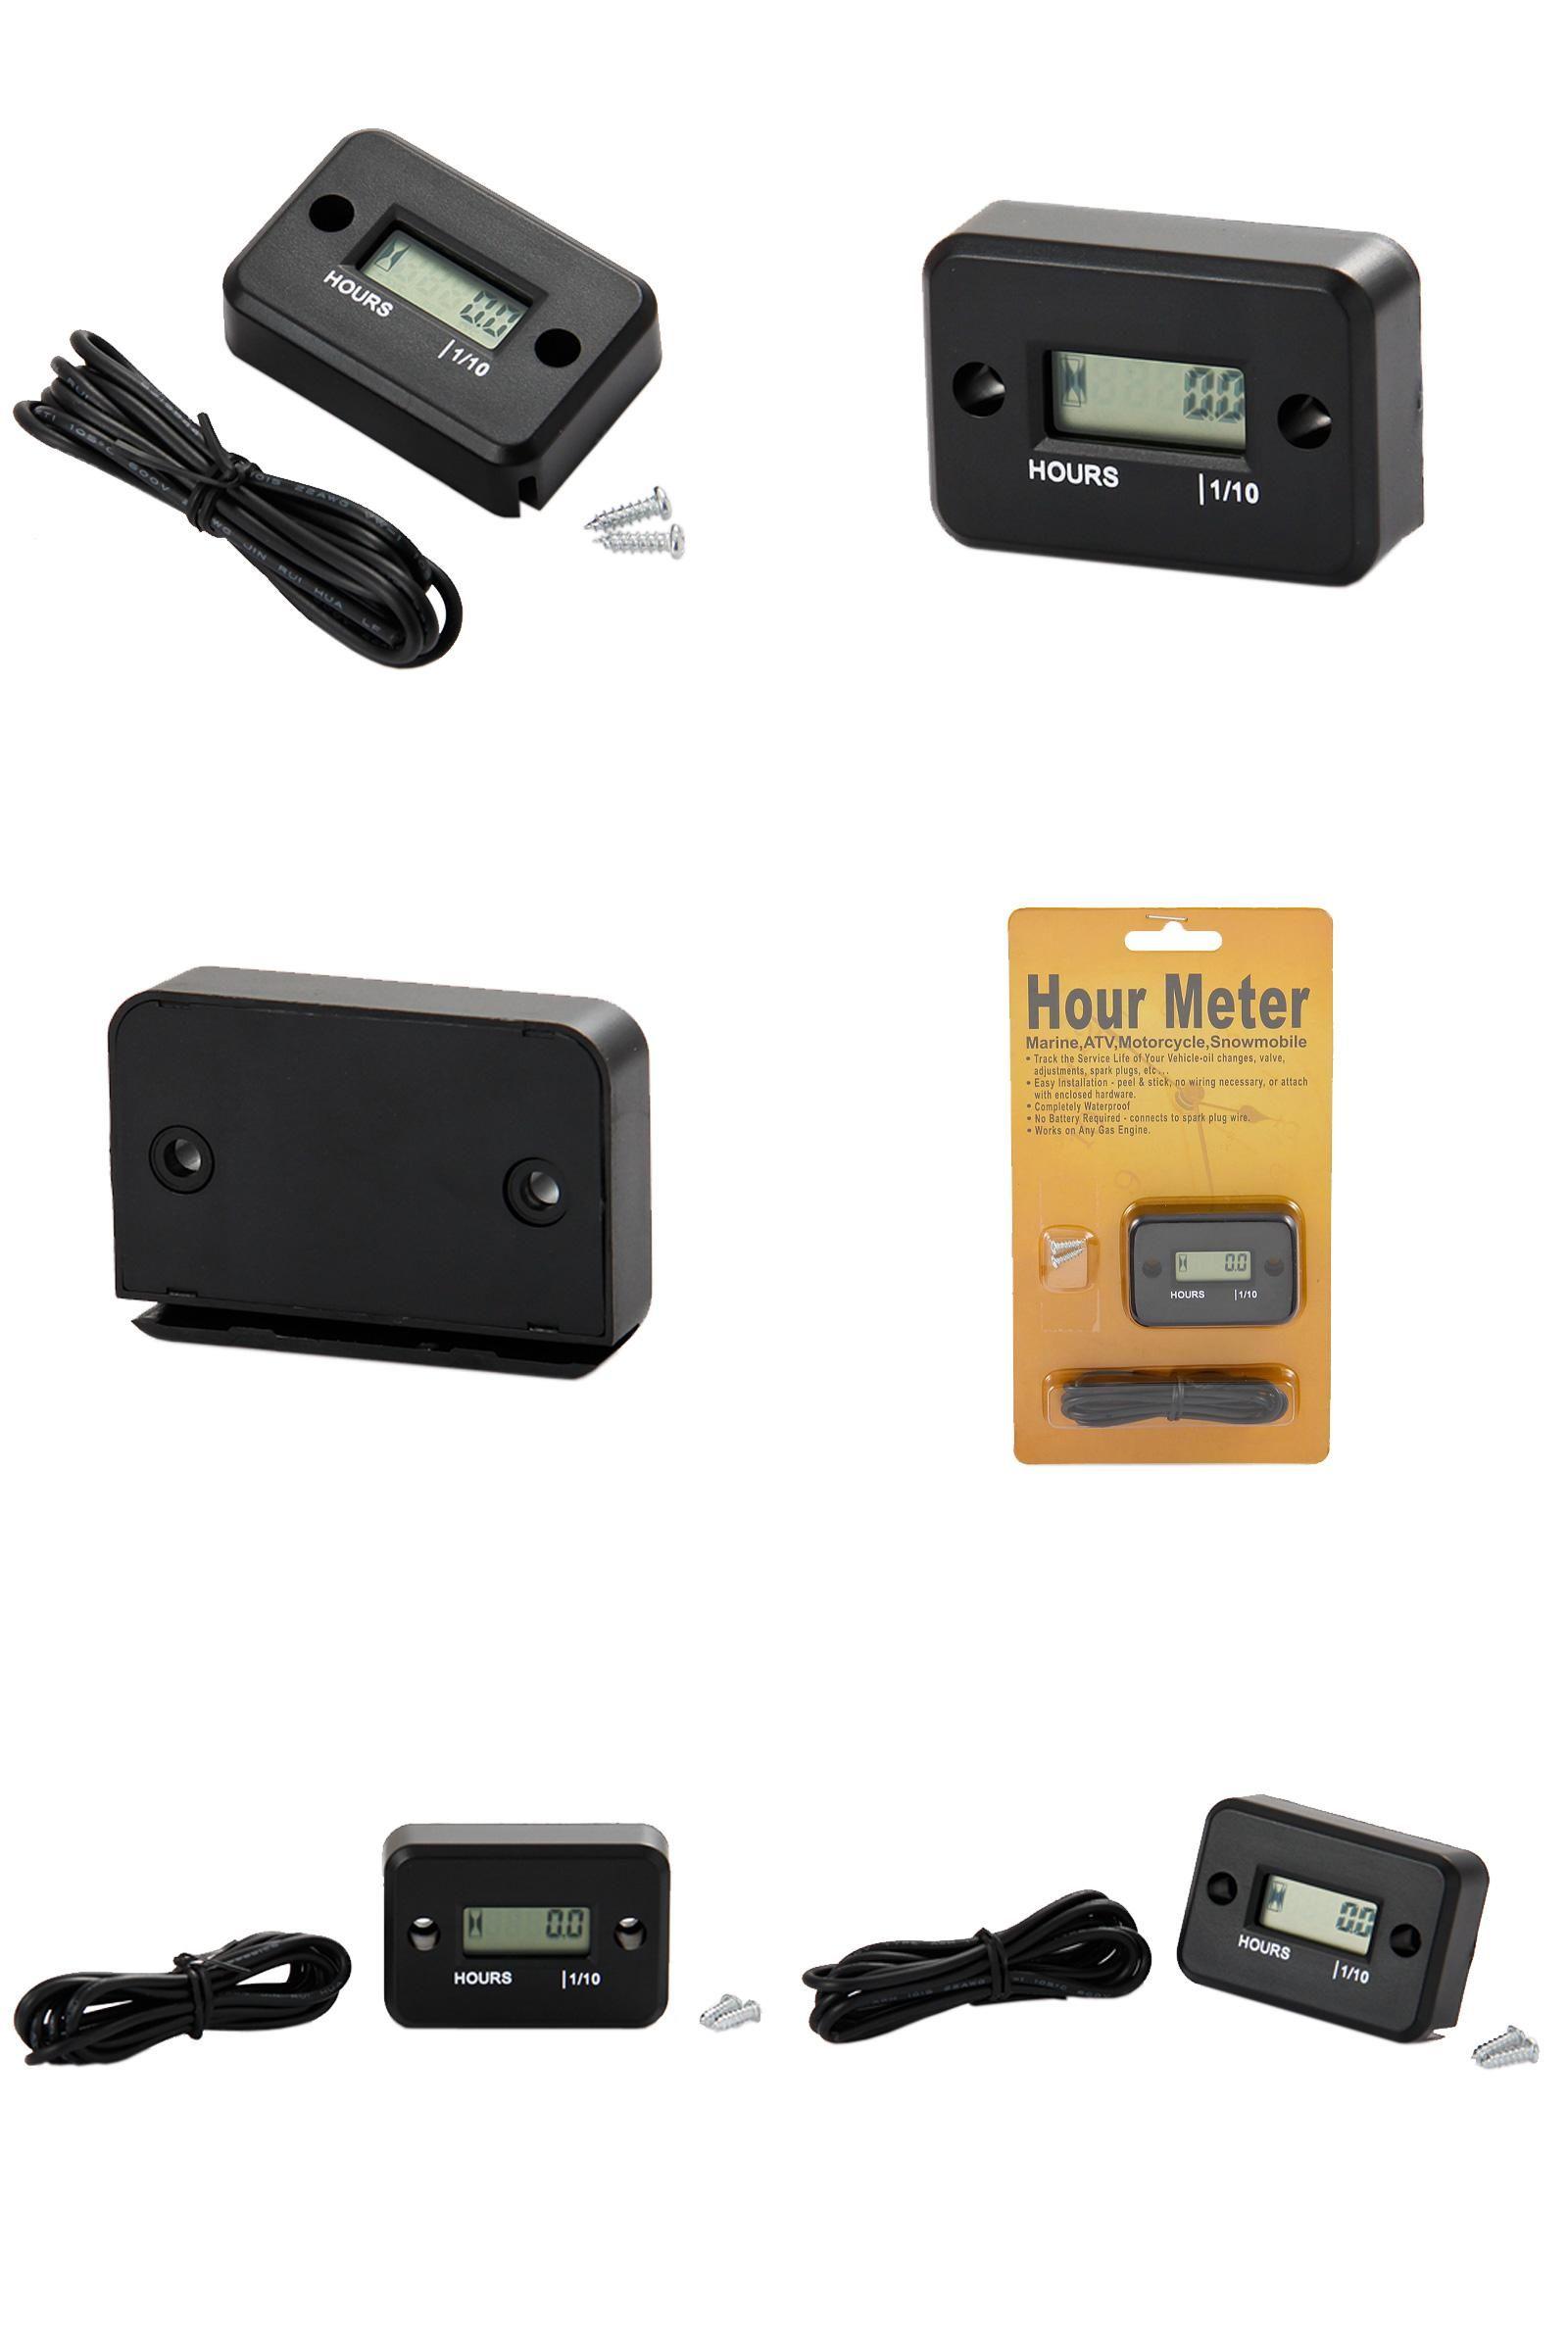 Jet Boat Hour Meter Wiring Trusted Schematics Diagram Vdo Marine Visit To Buy Waterproof Digital Lcd Counter For Dirt Auto Fuel Gauge